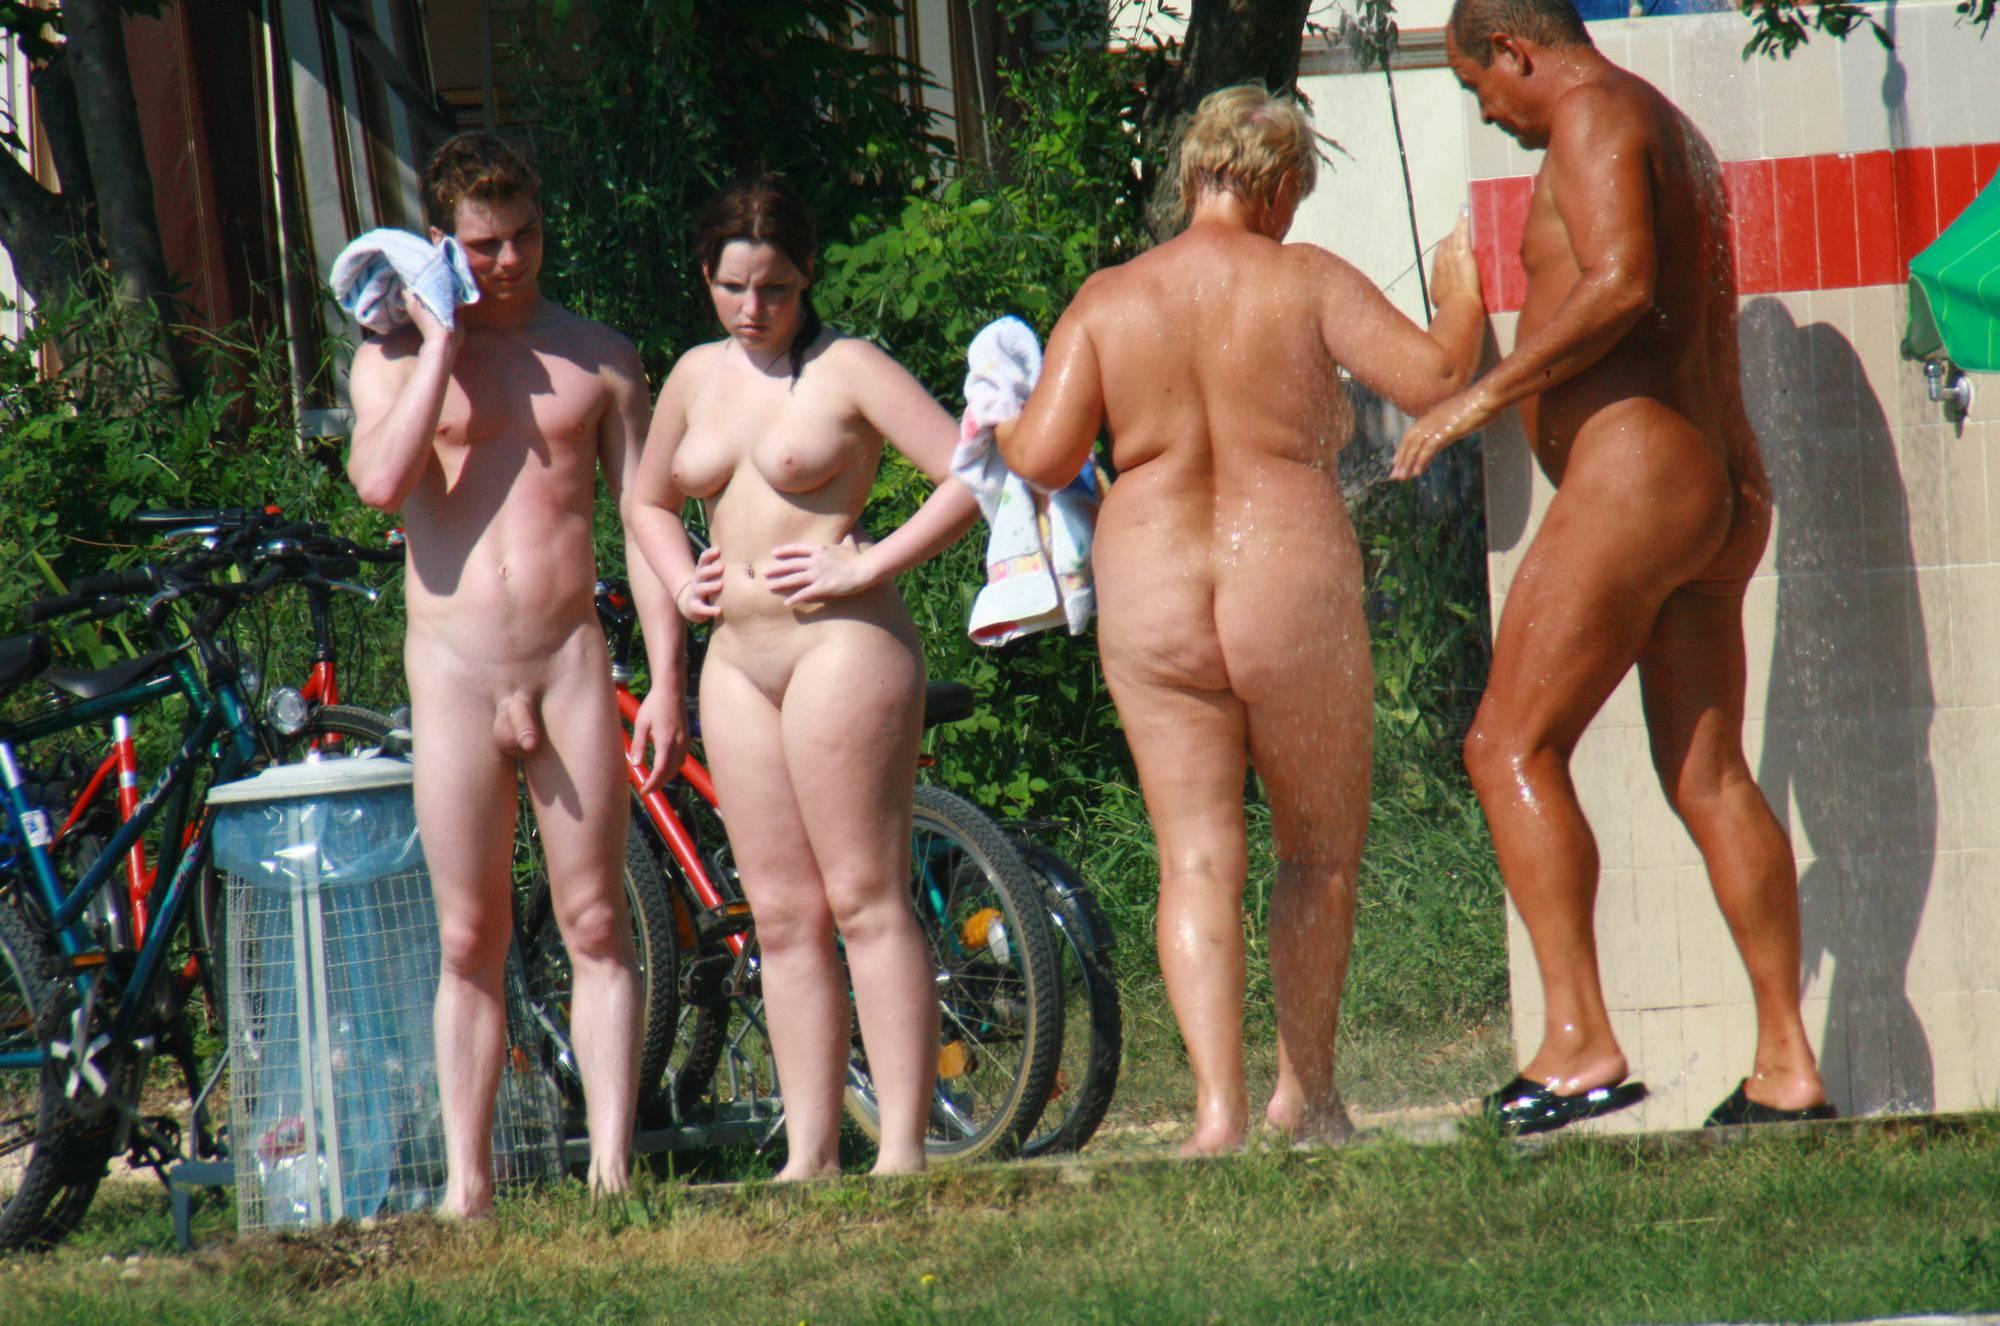 Pure Nudism Images Friend Shore Adventure - 2